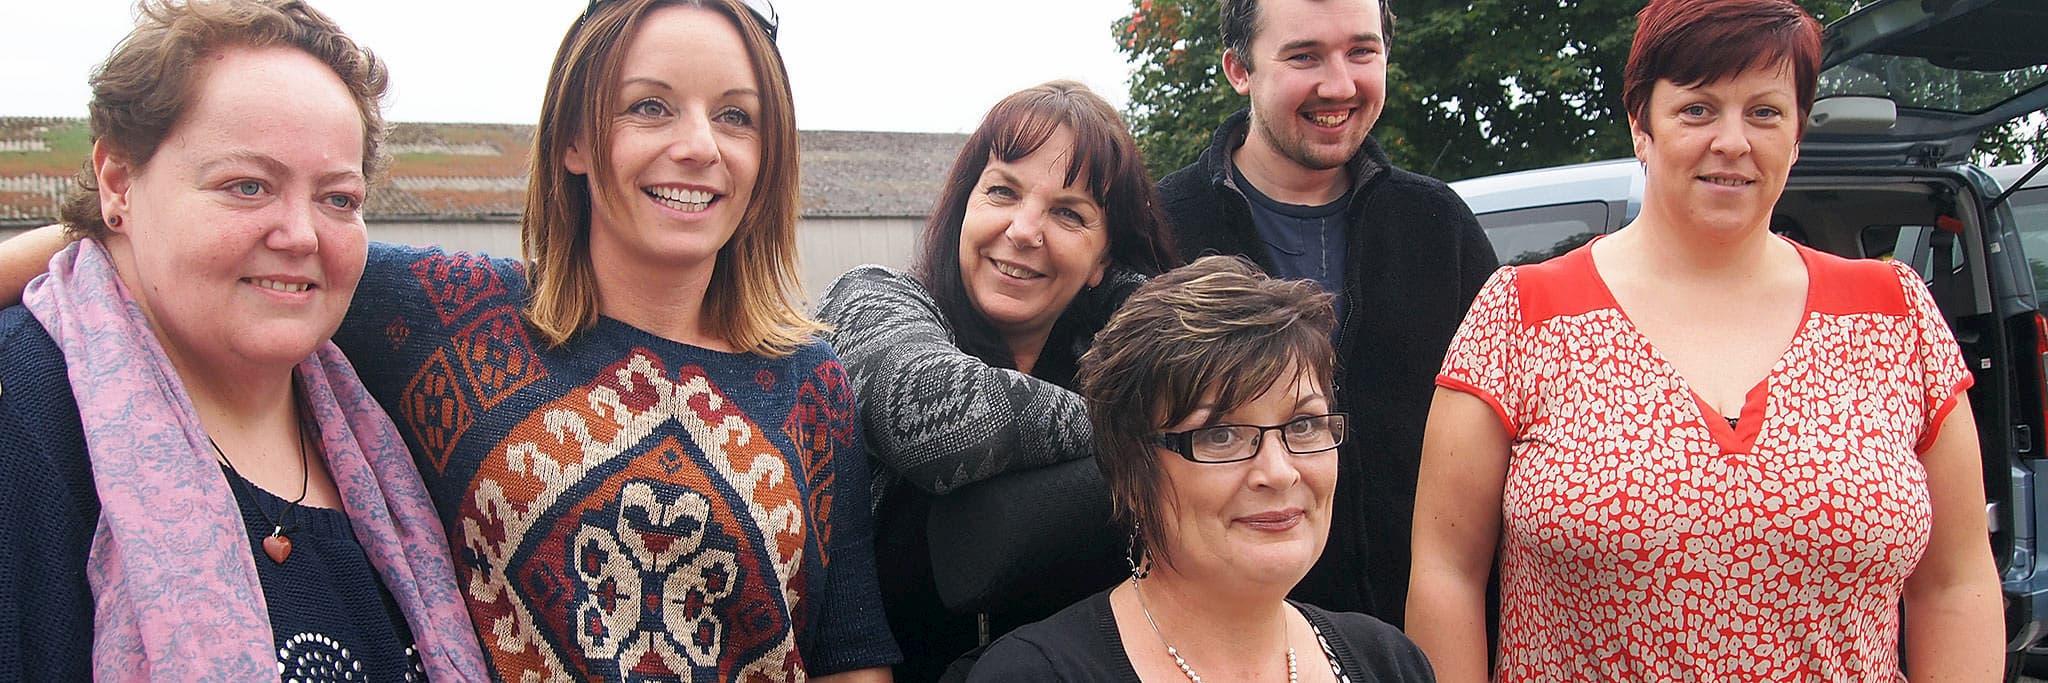 Moray team group portrait